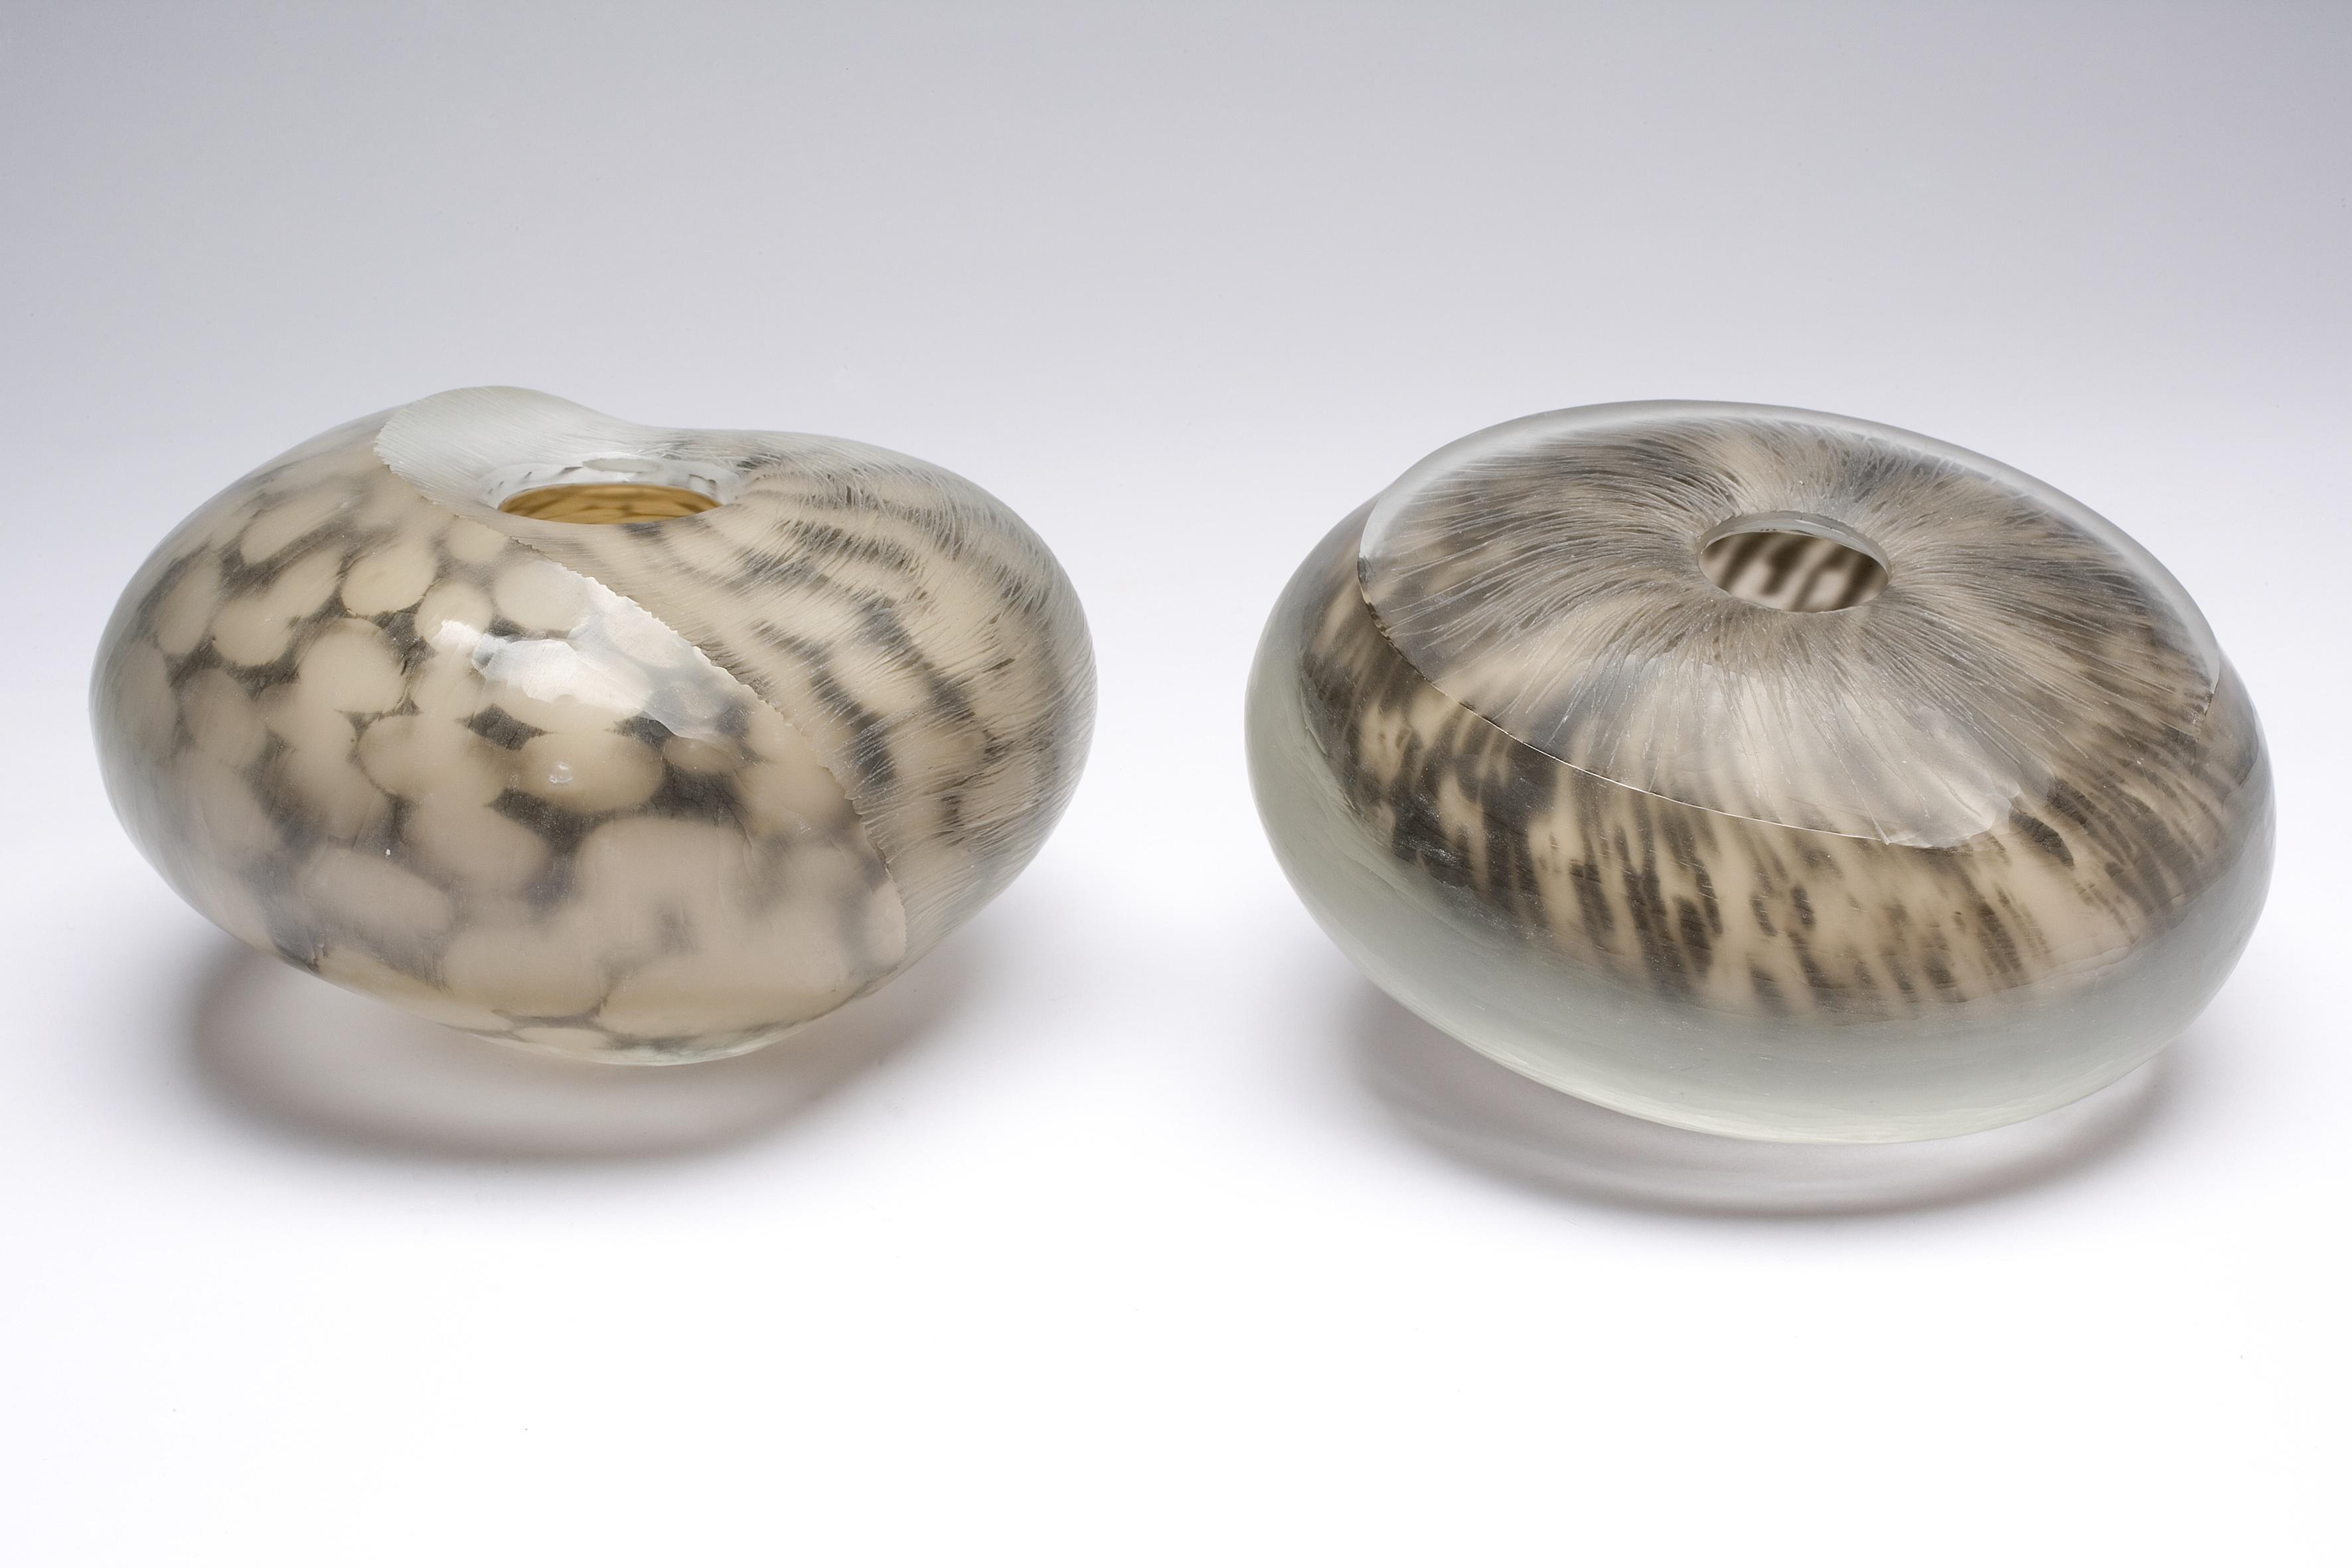 Symbiosis Series, 2007